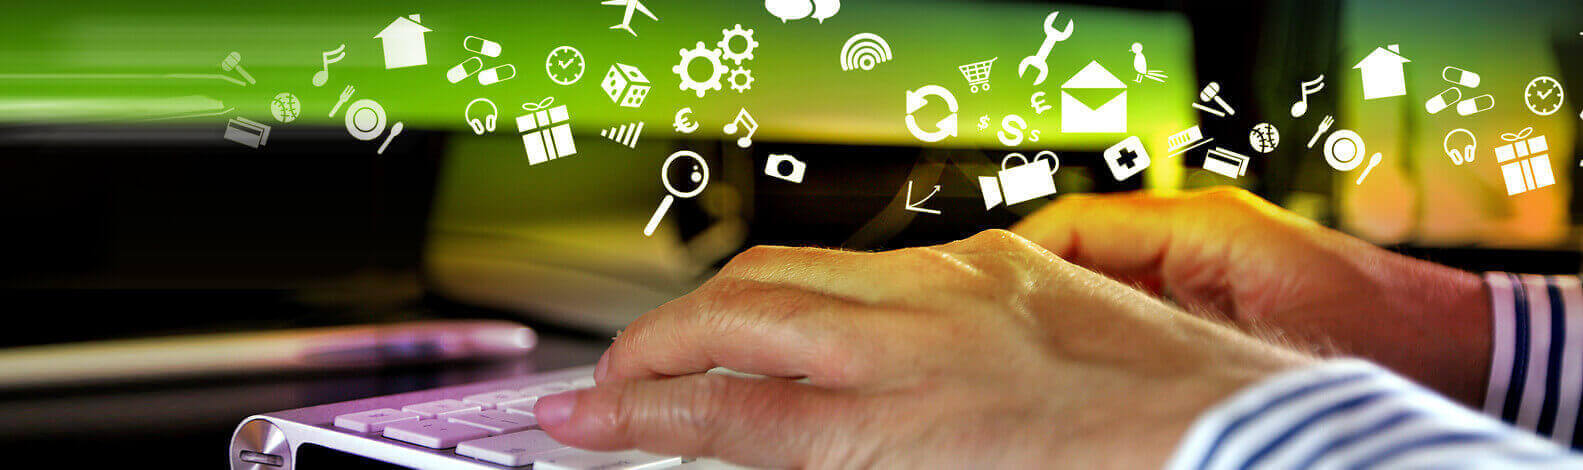 Portal & Mobile Application Development